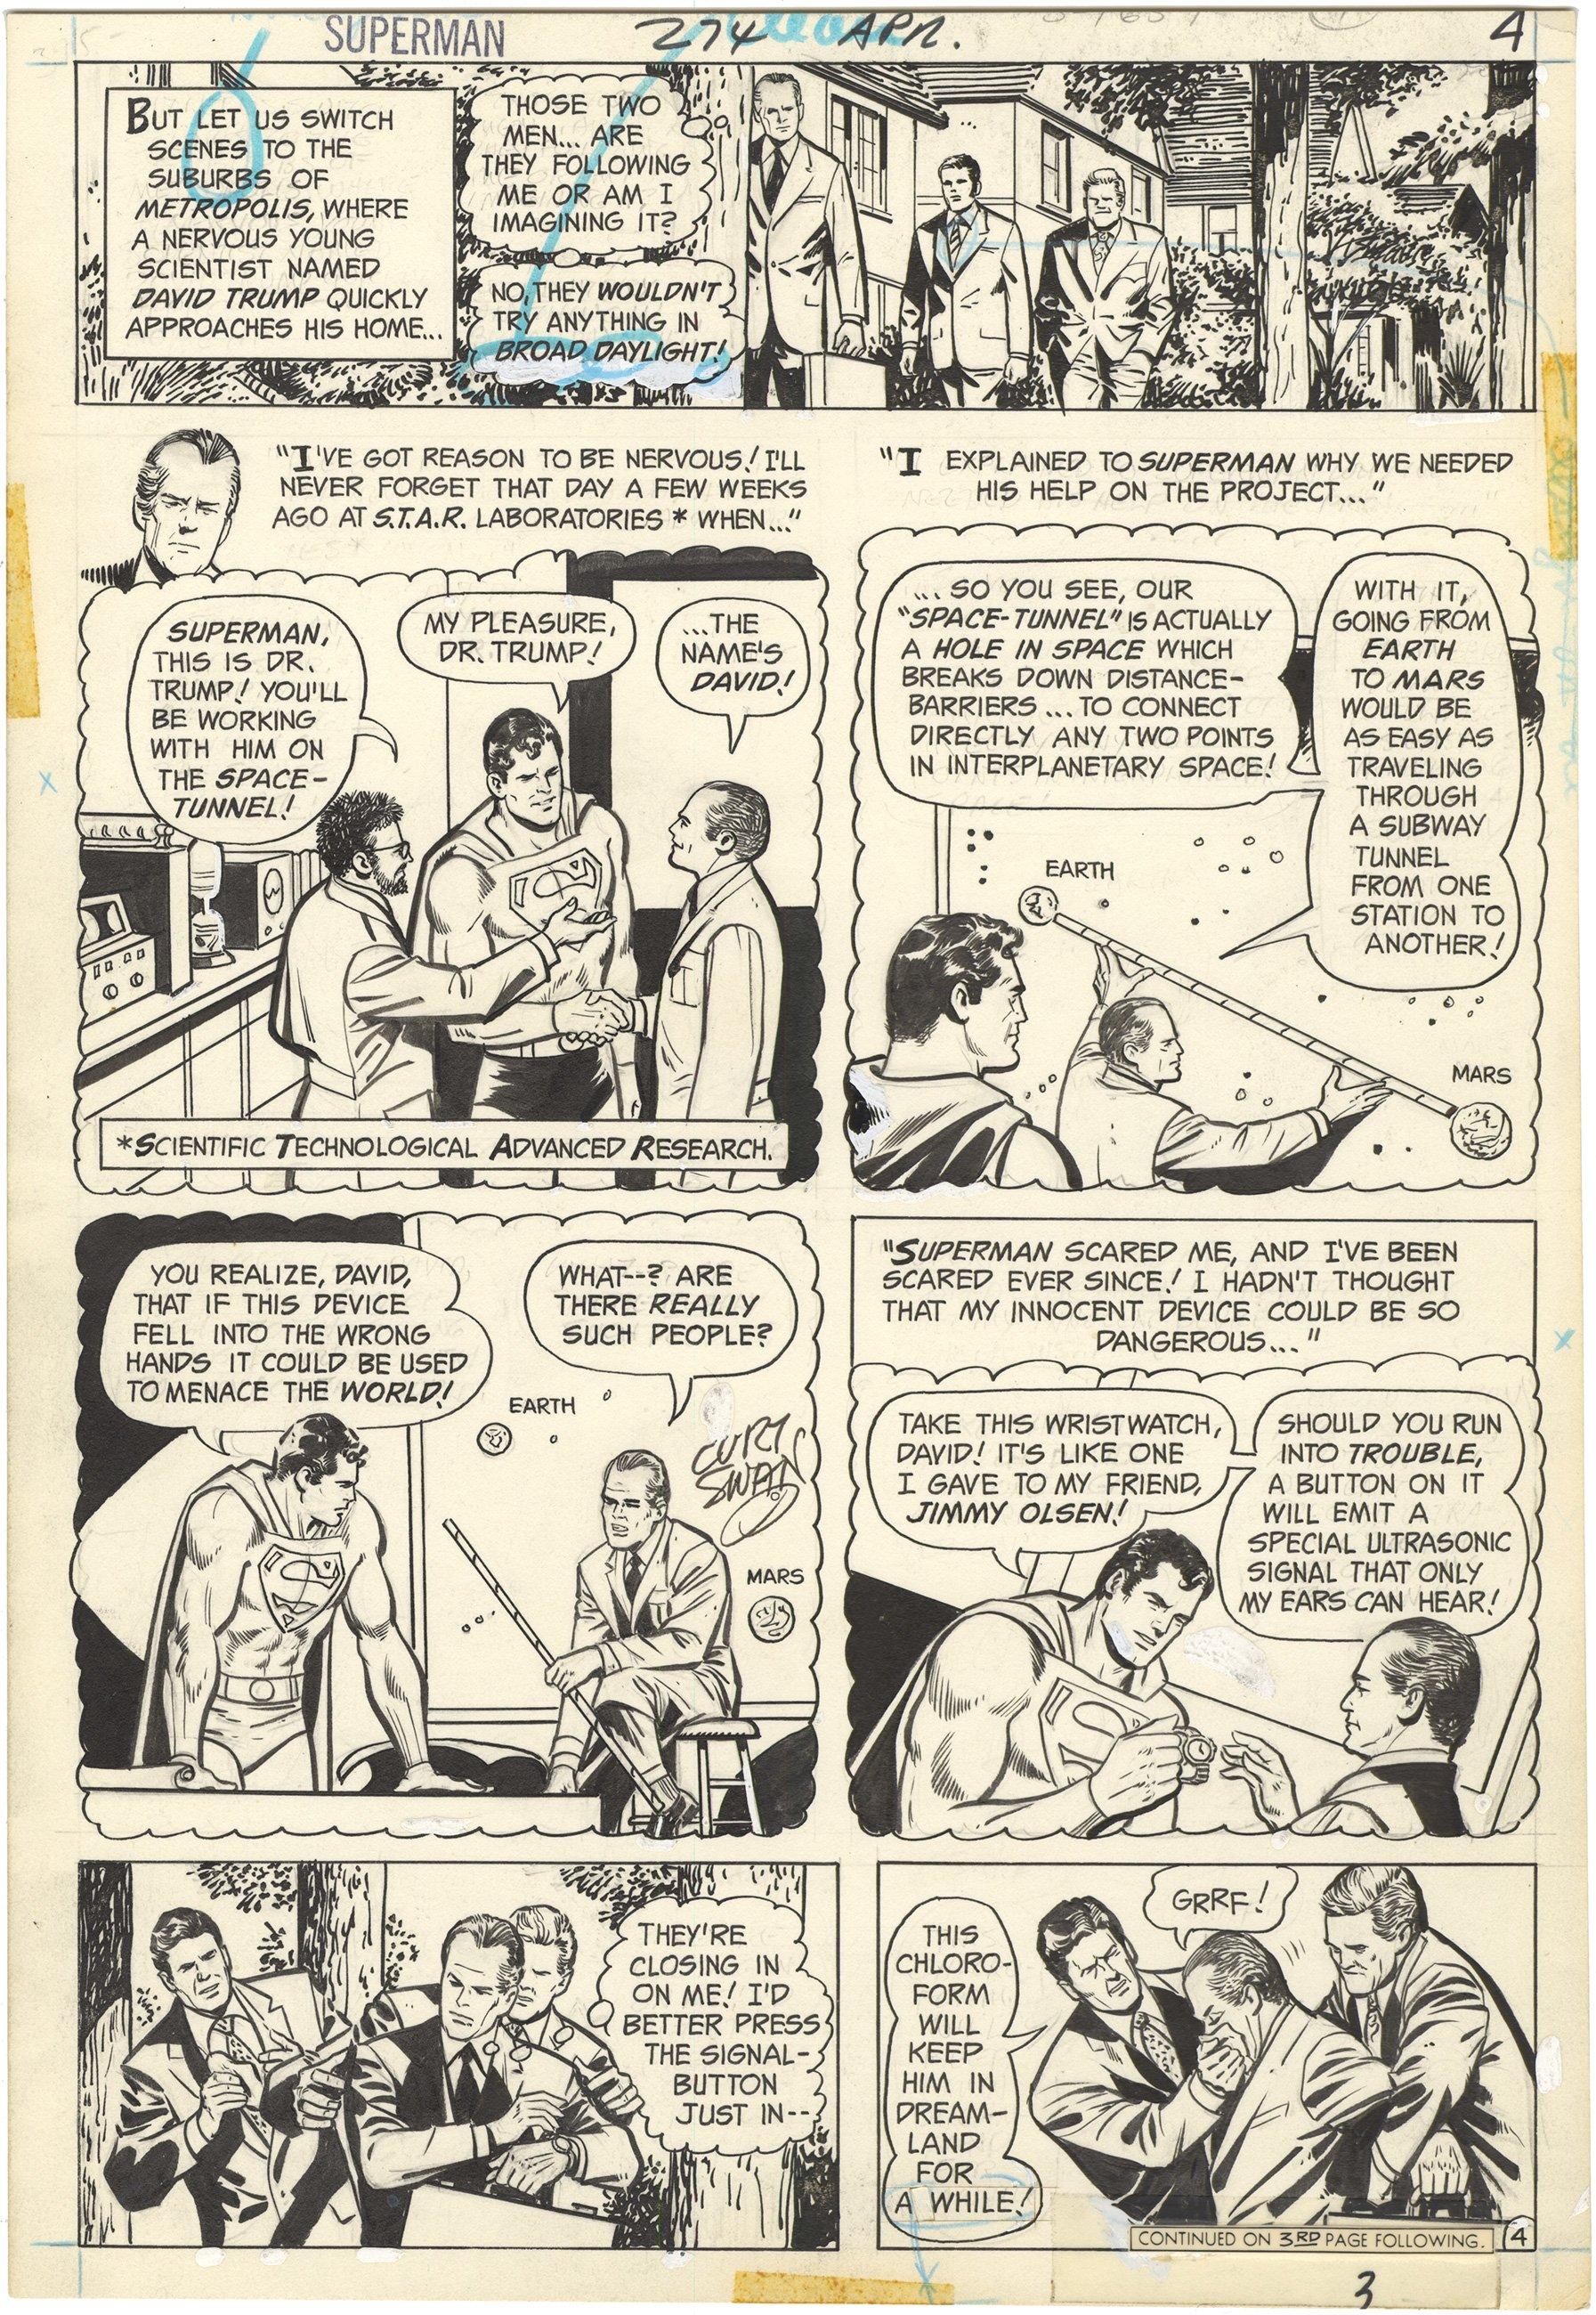 Superman #274 p4 (Signed)